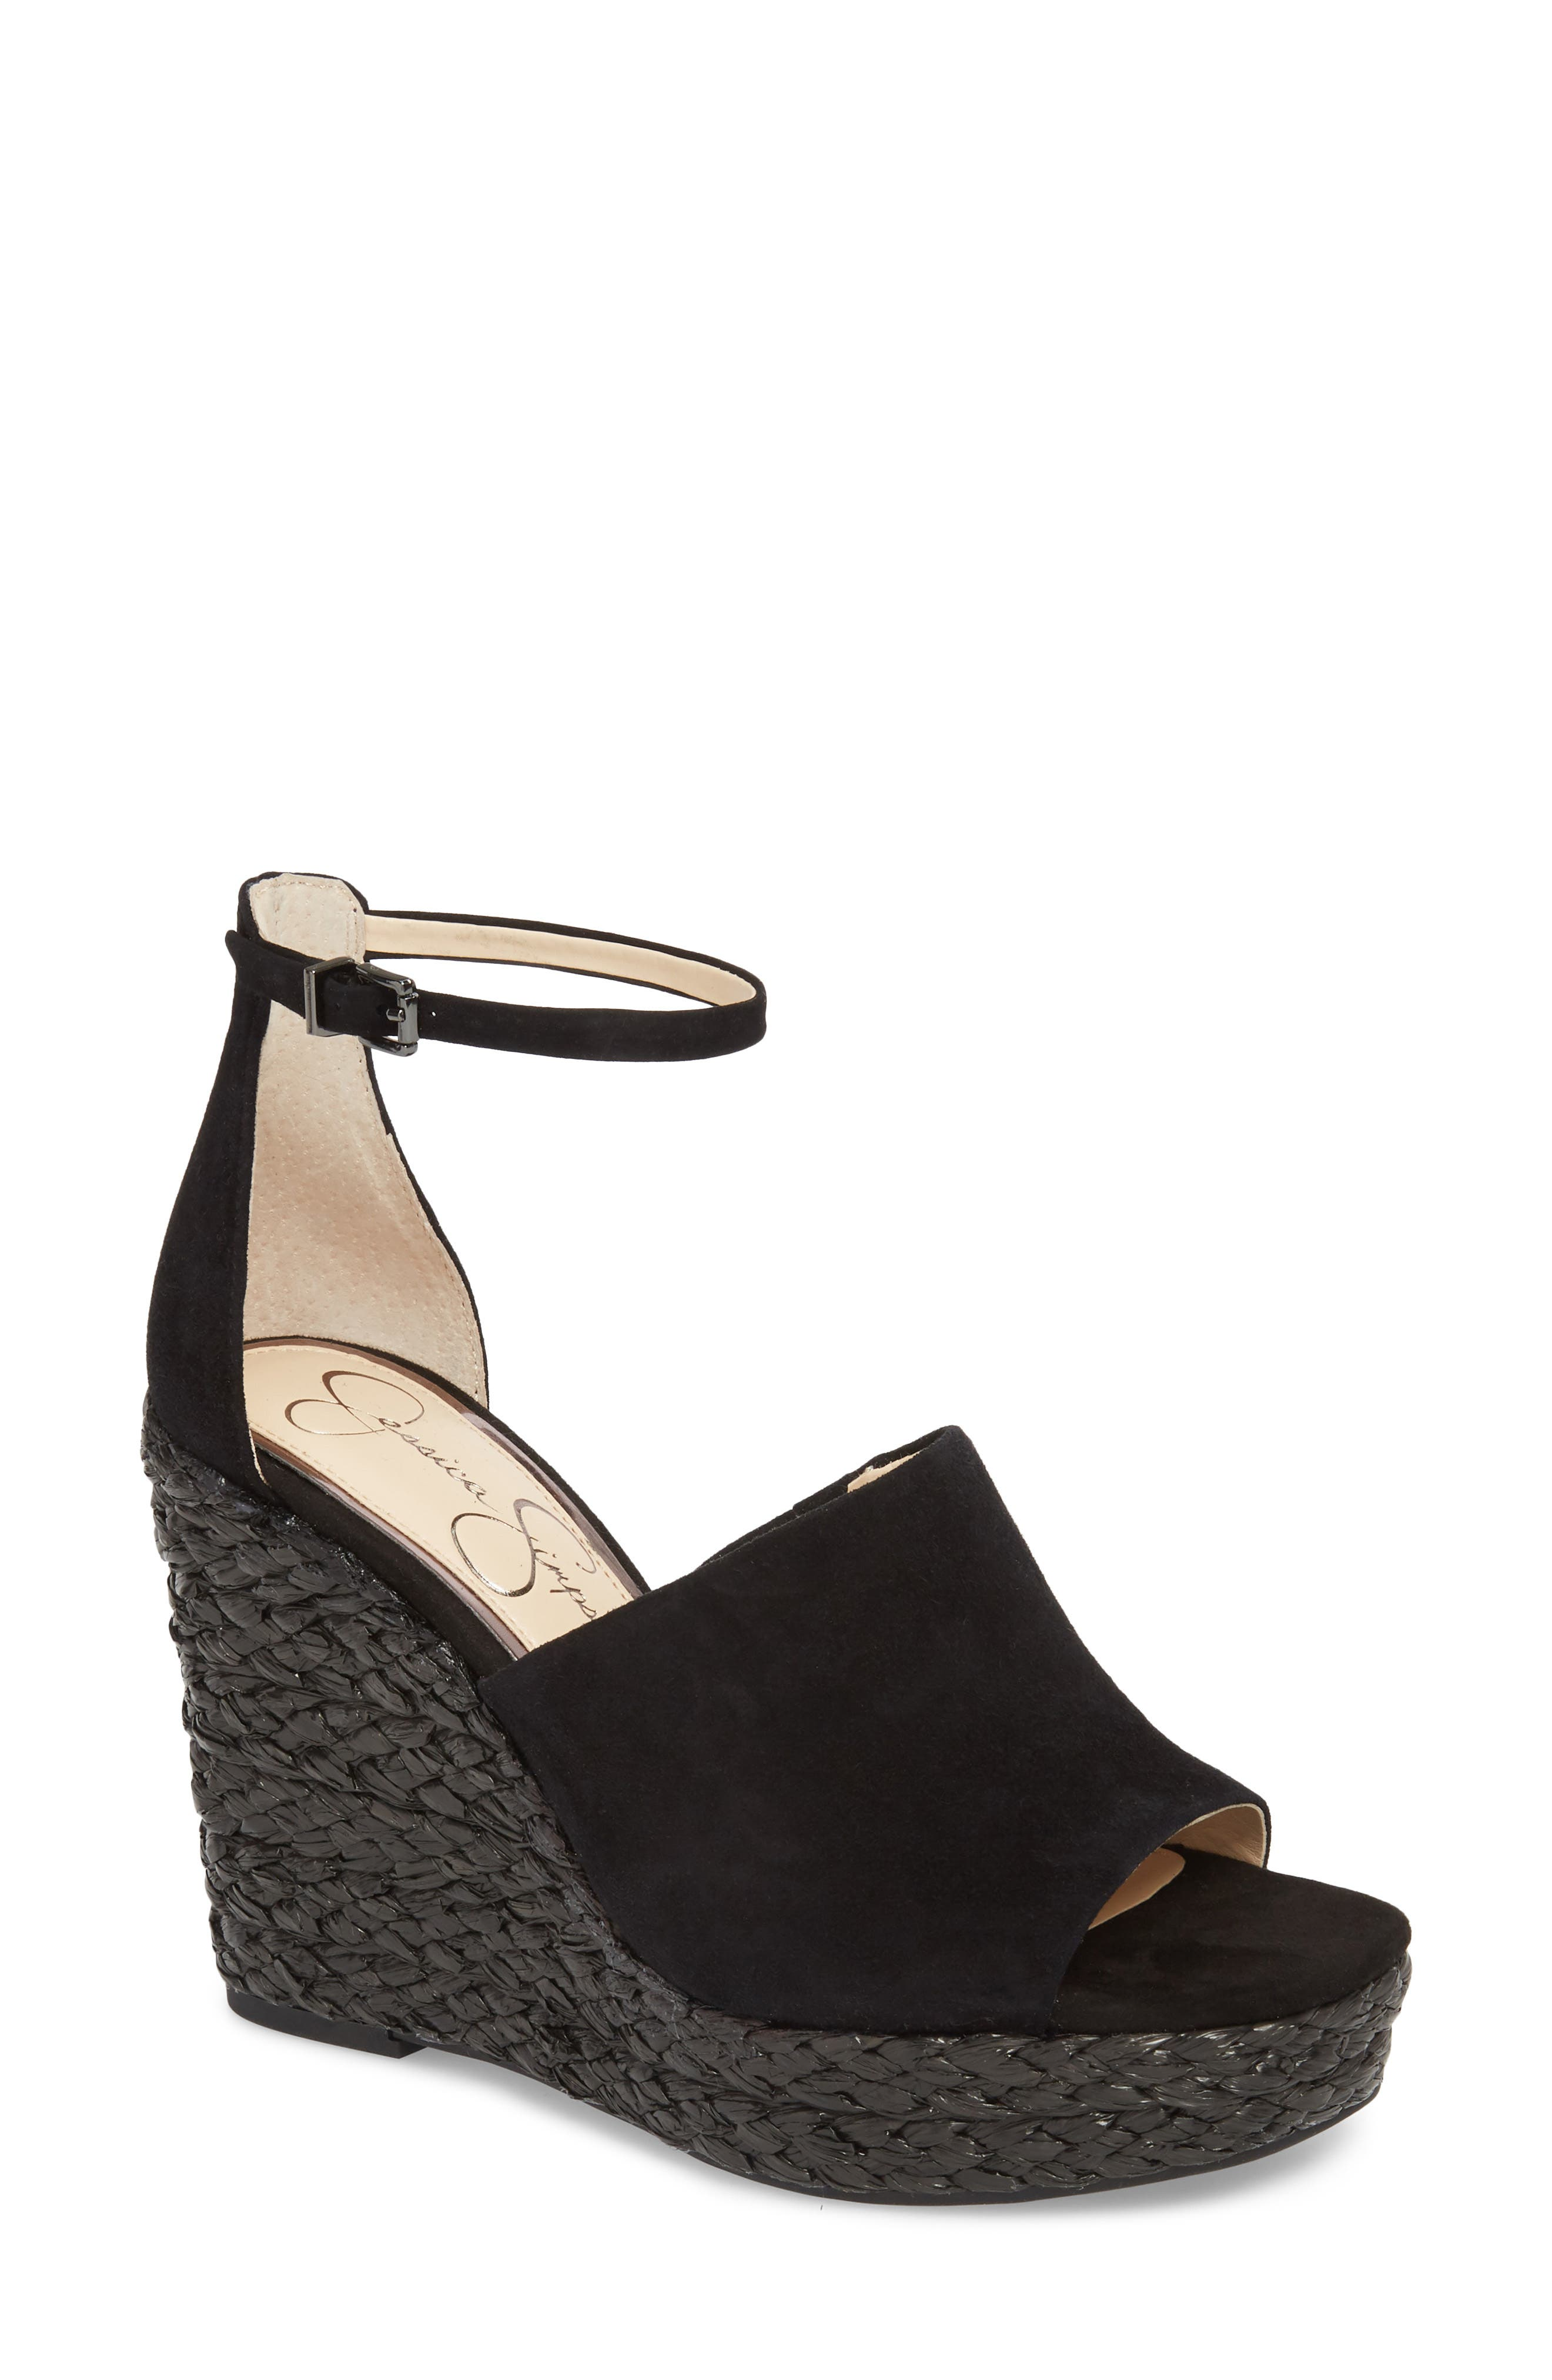 Suella Wedge Sandal,                         Main,                         color, 001